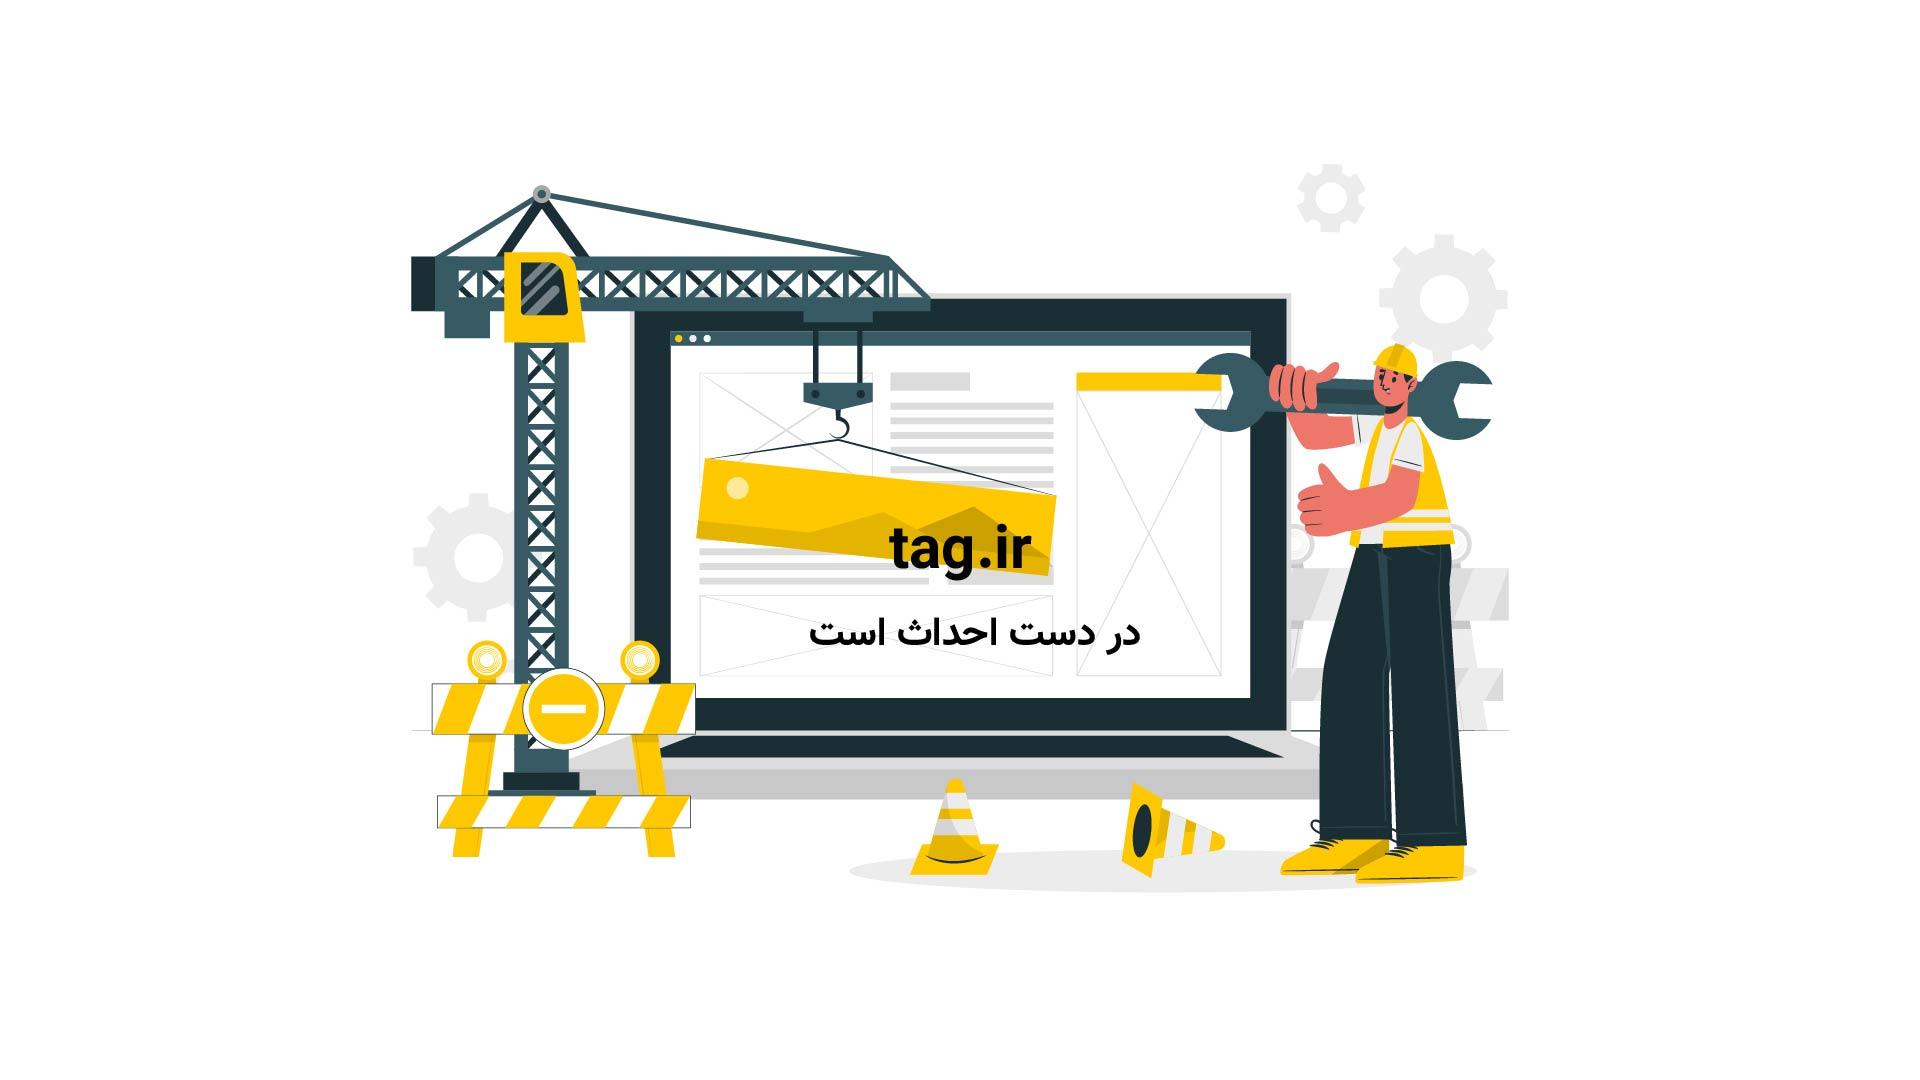 عقاب پهپاد | تگ